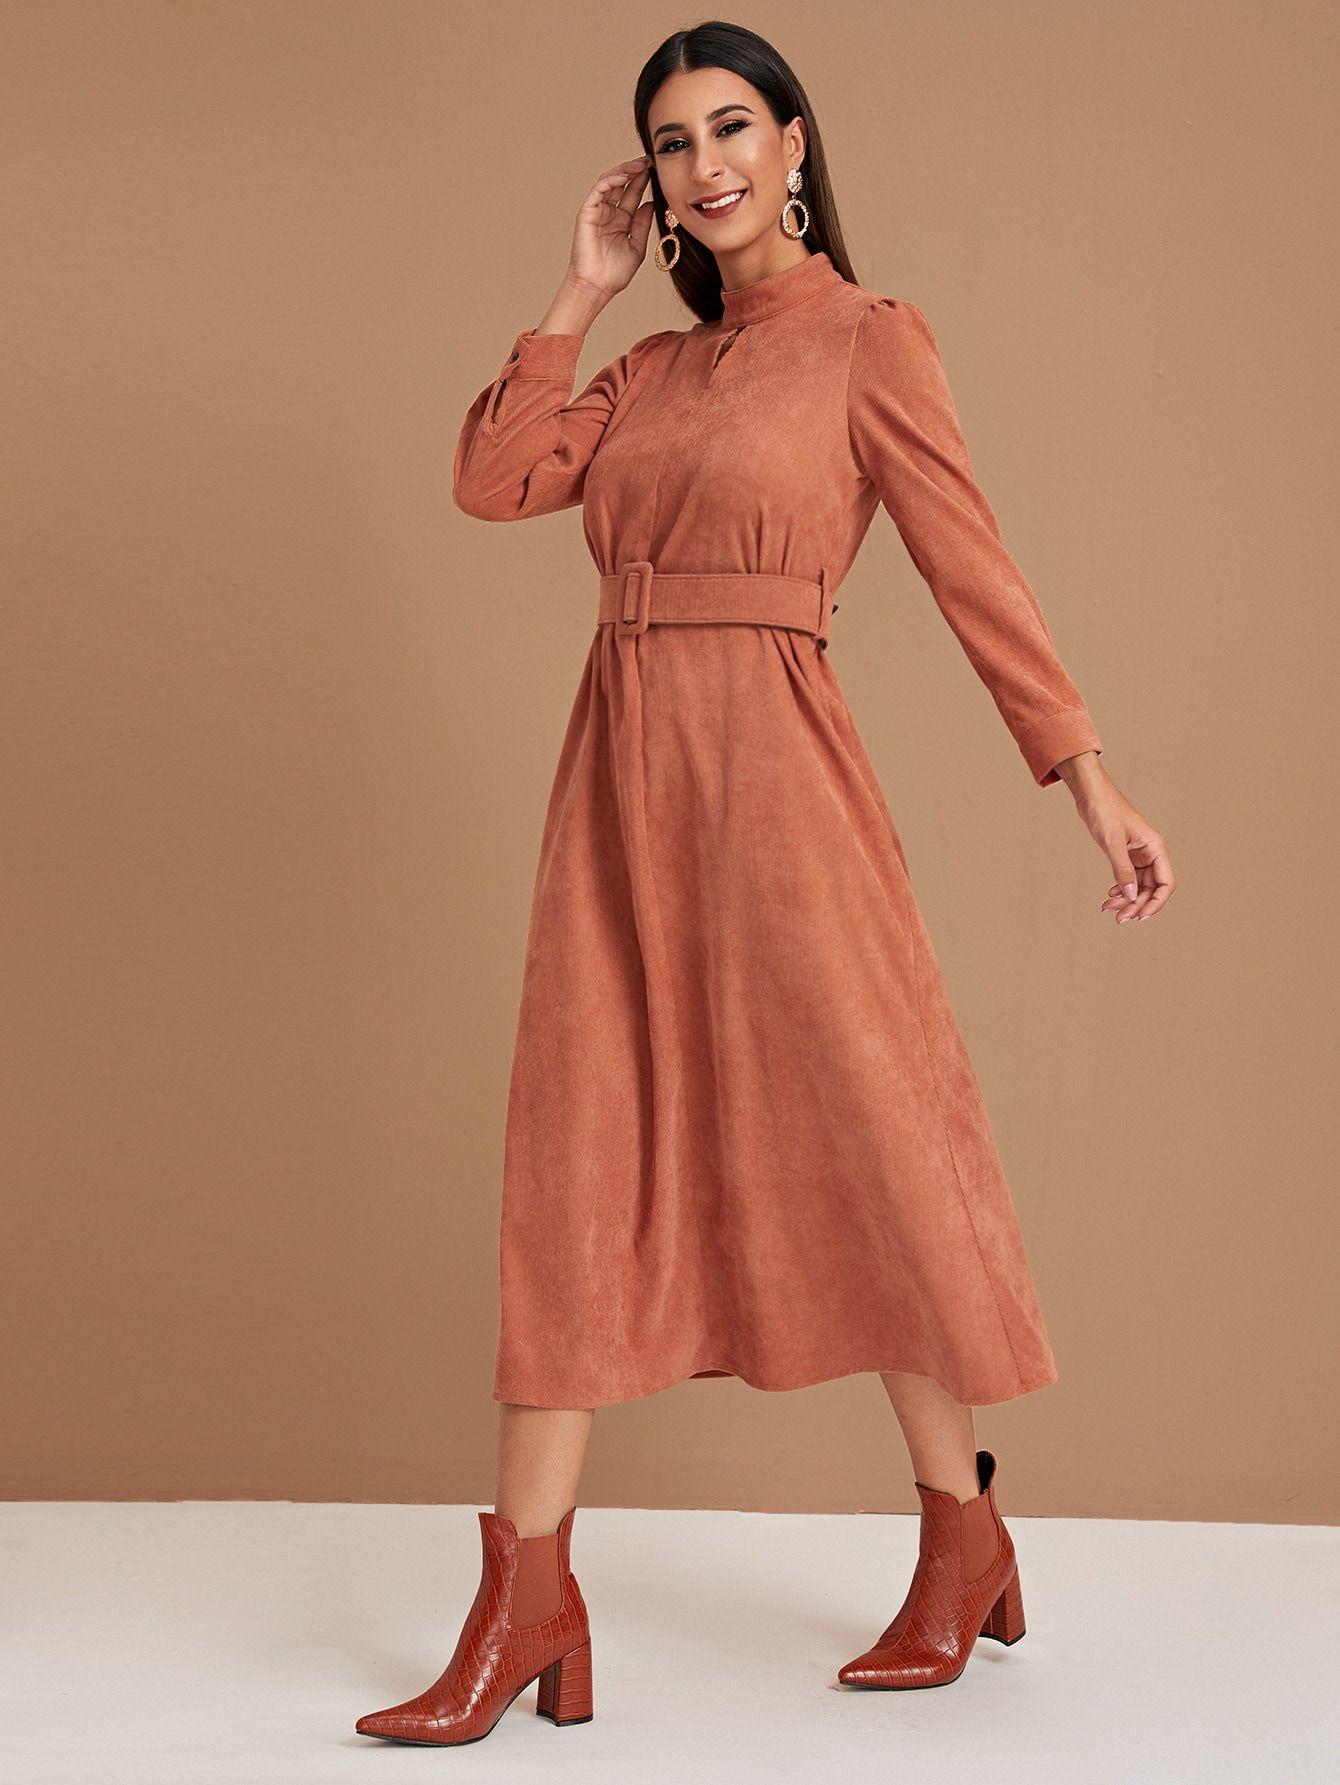 Ad Keyhole Front Self Tie Corduroy Dress Tags Casual Orange Plain Keyholeneckline Long Aline Cutout Belte Necklines For Dresses Dresses Corduroy Dress [ 1785 x 1340 Pixel ]